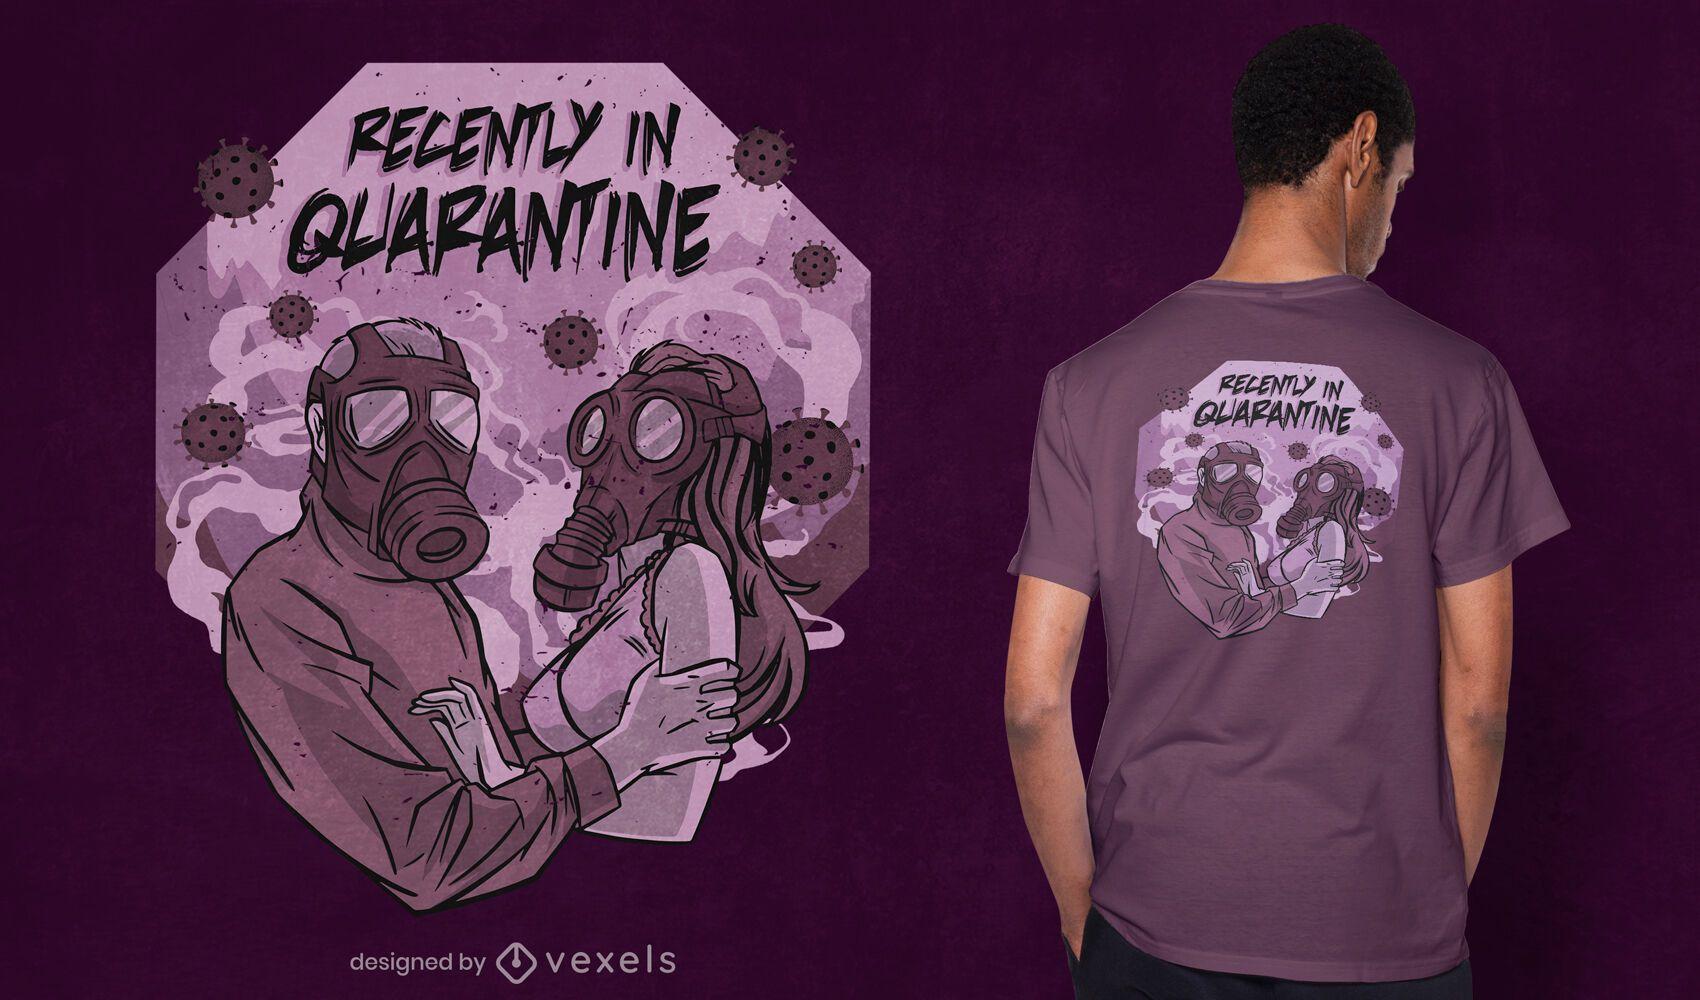 Recently in quarantine t-shirt design